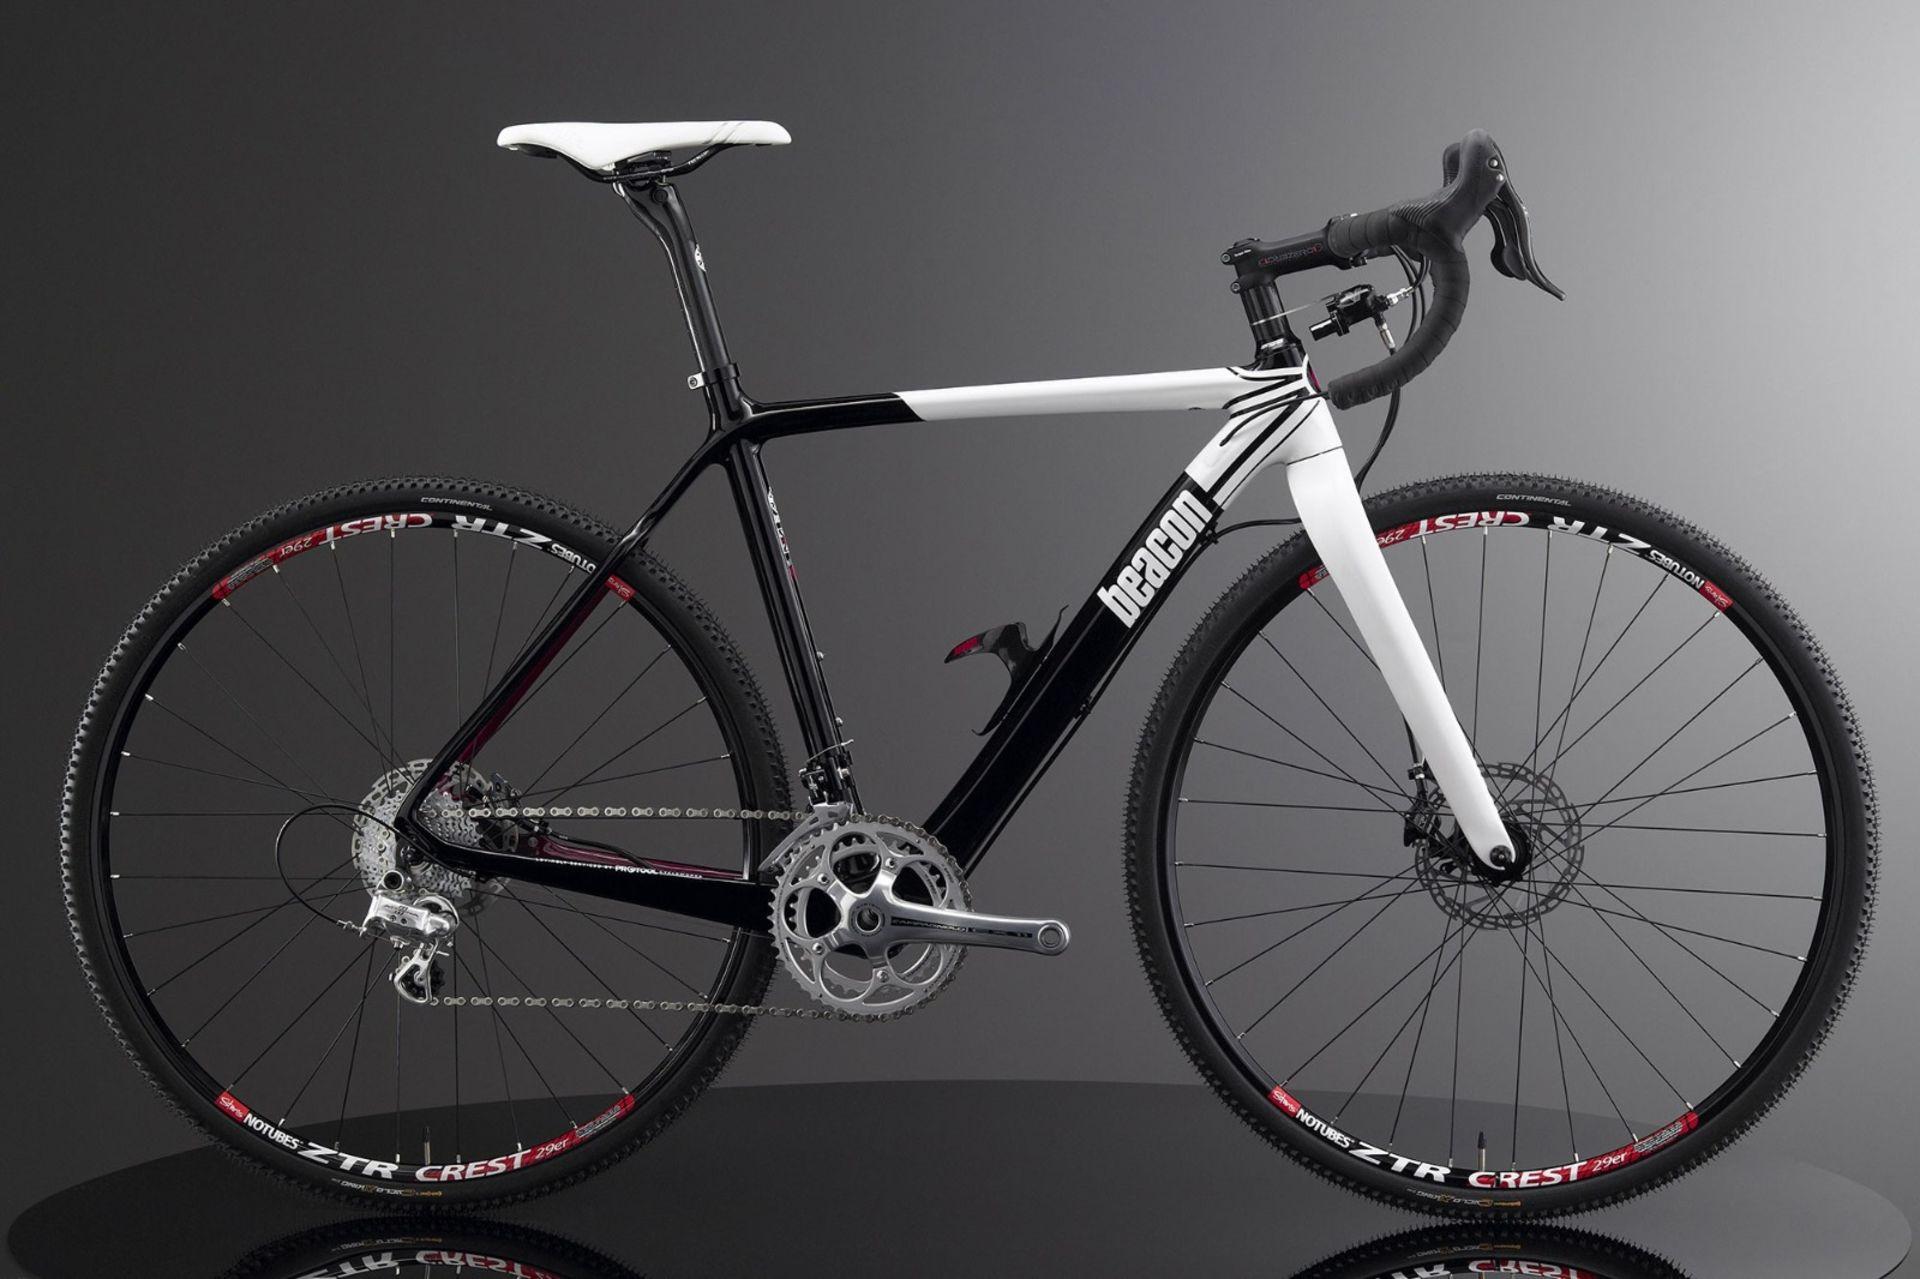 Lot 7 - 1 x Beacon Model BF-45, Size 540, Carbon Fibre Bike Frame in Black & White.